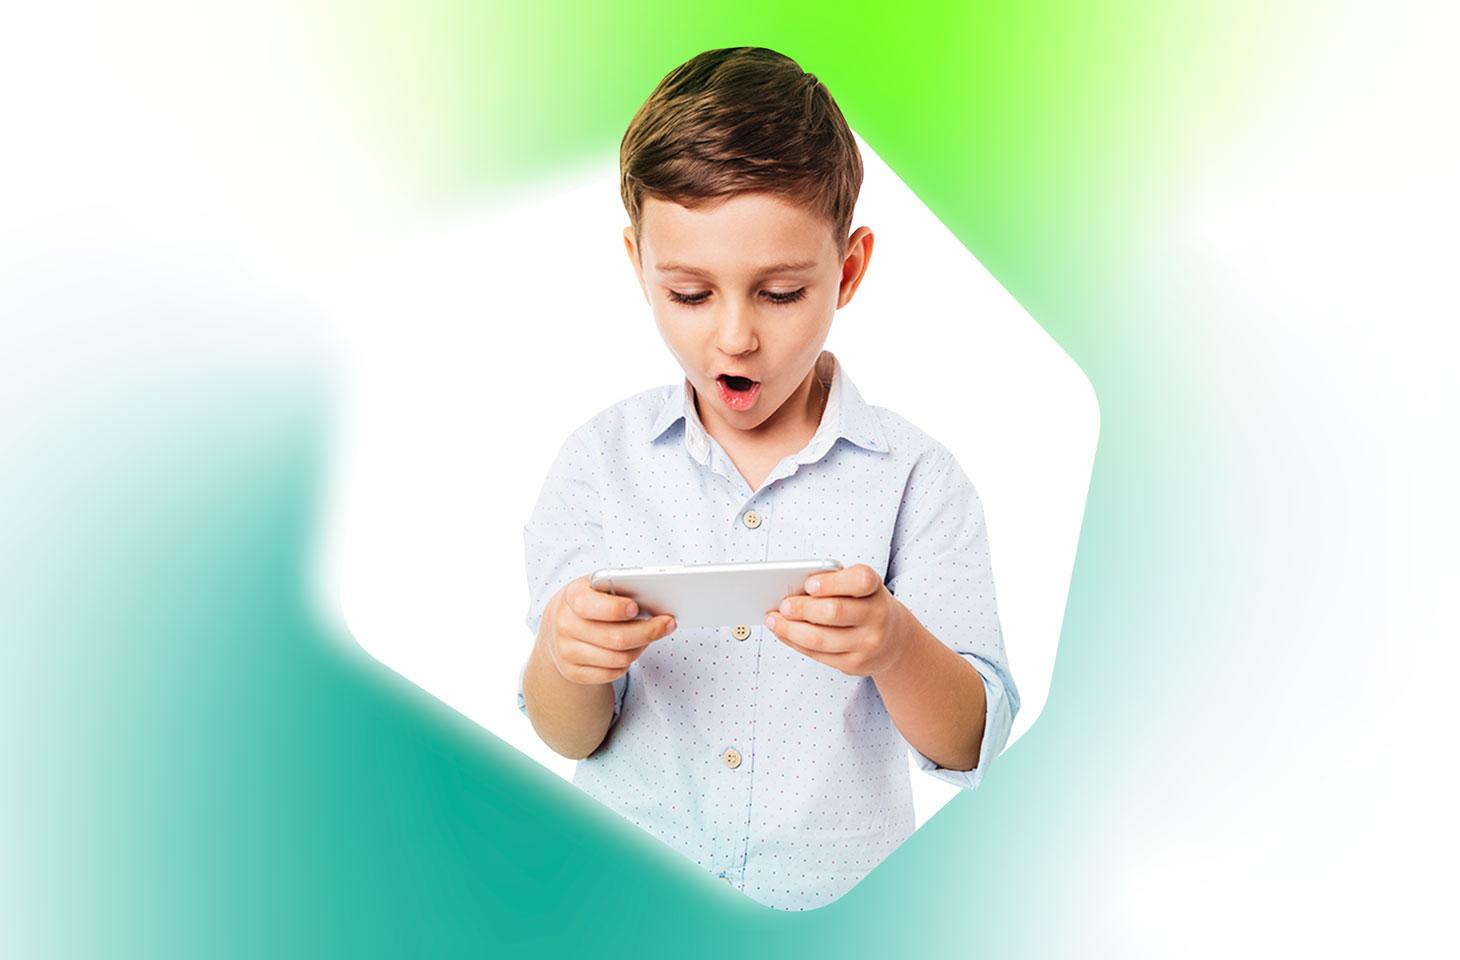 Safer smartphones for schoolchildren